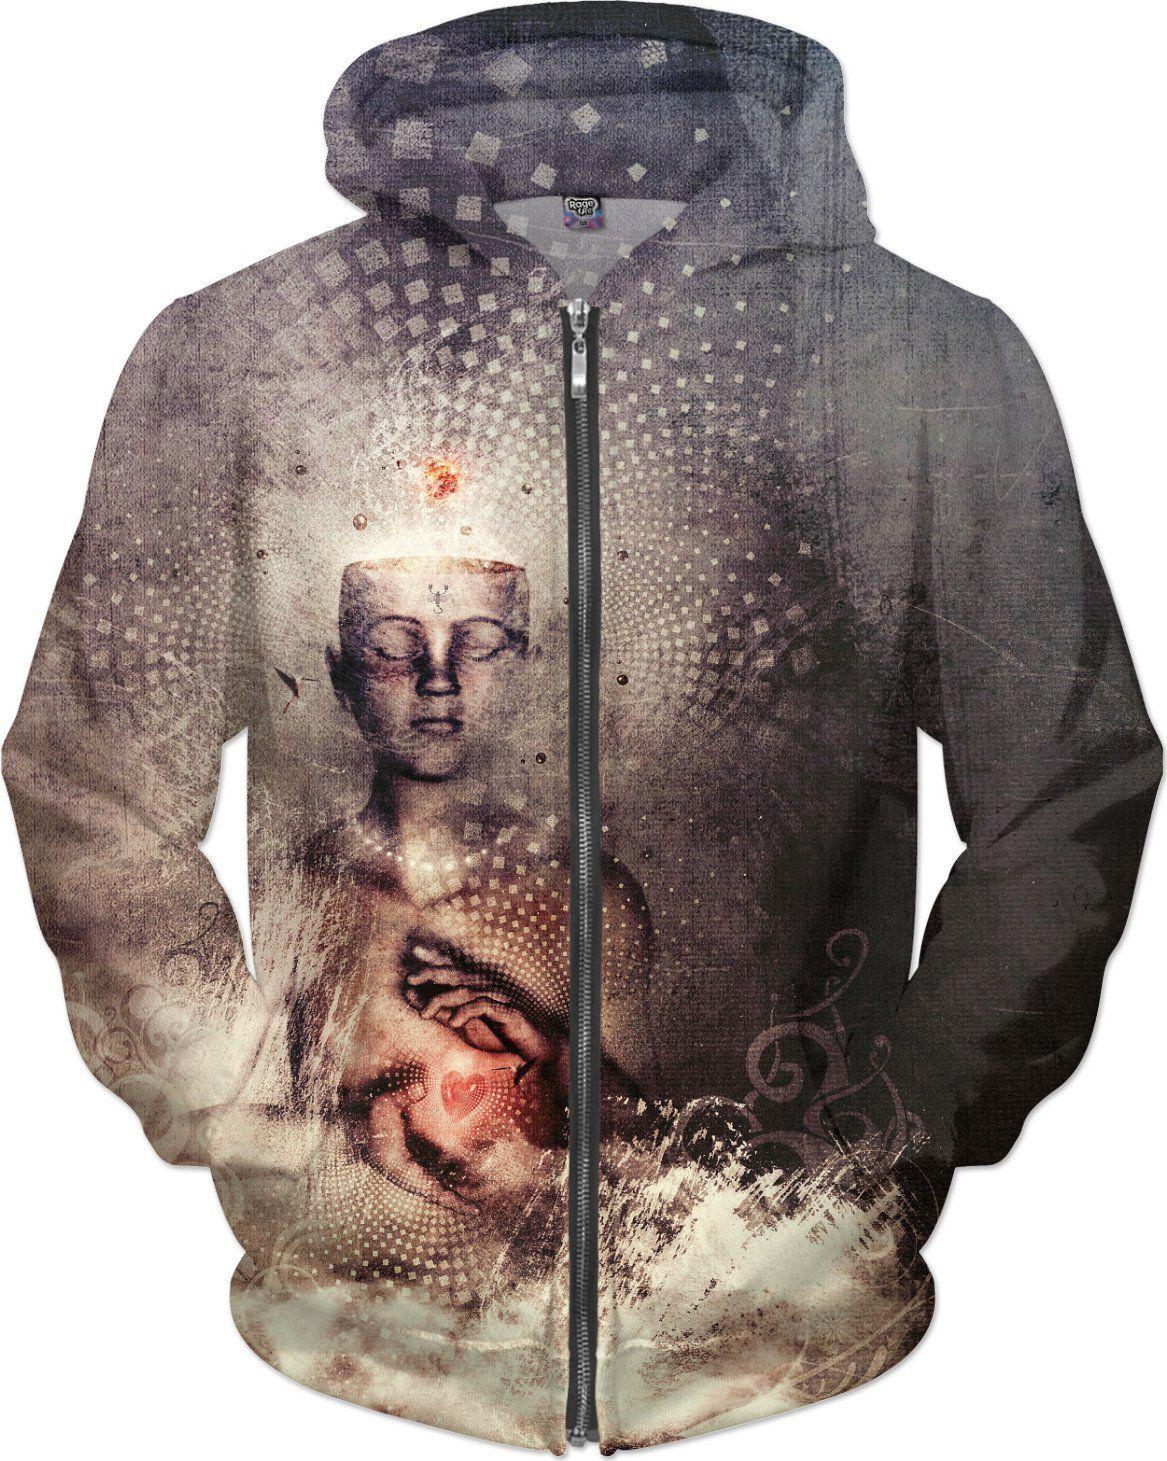 Green Spirits Zipup Sweatshirt - Trippy Hoodie - Rave Clothes - EDM Festival Clothing Hoody HhPsG